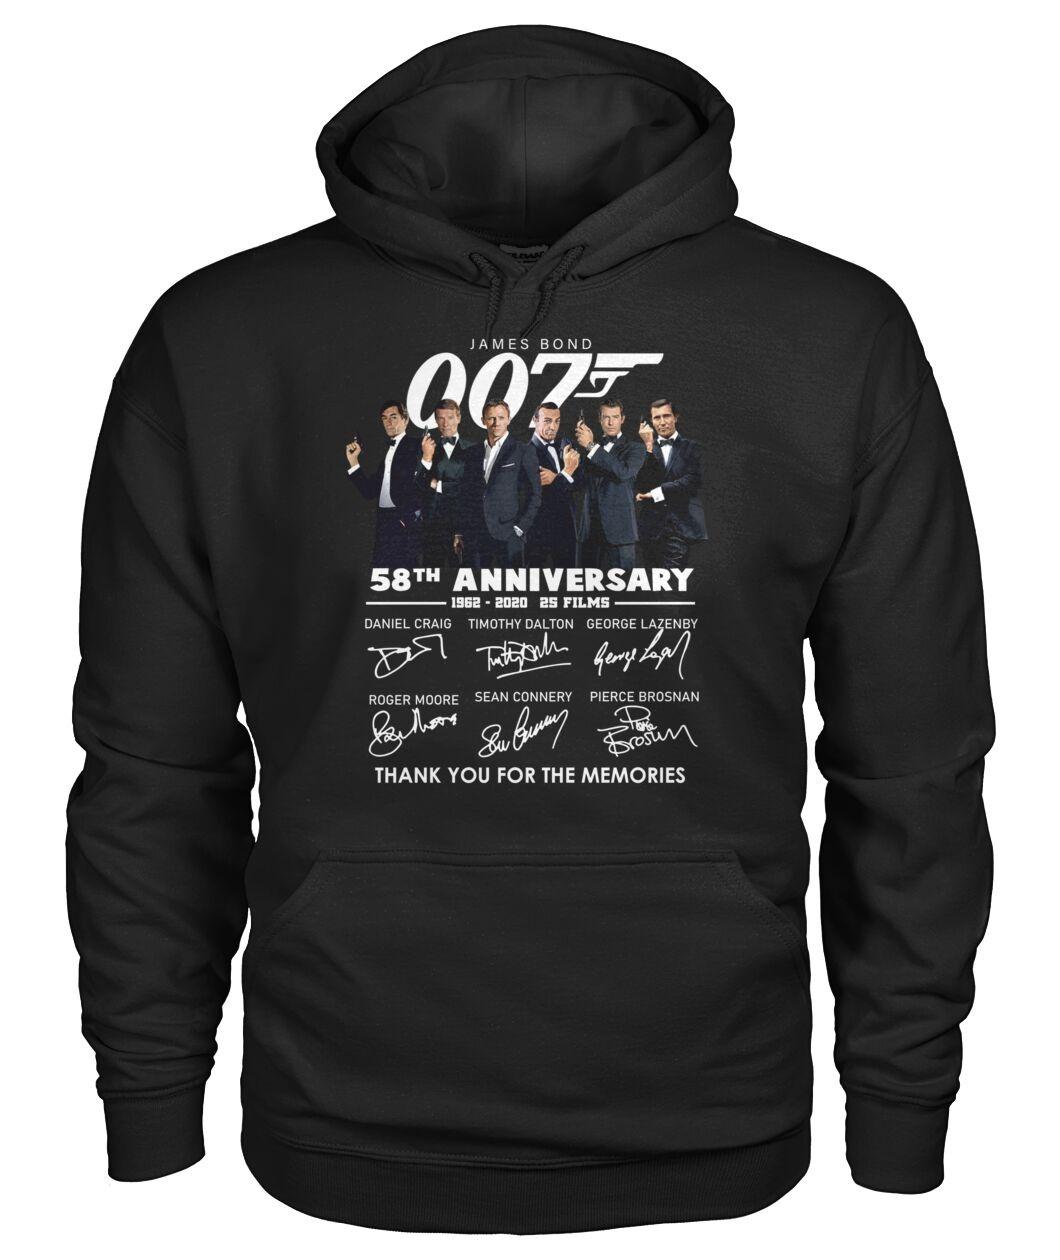 007 James Bond 58th Anniversary Hoodie